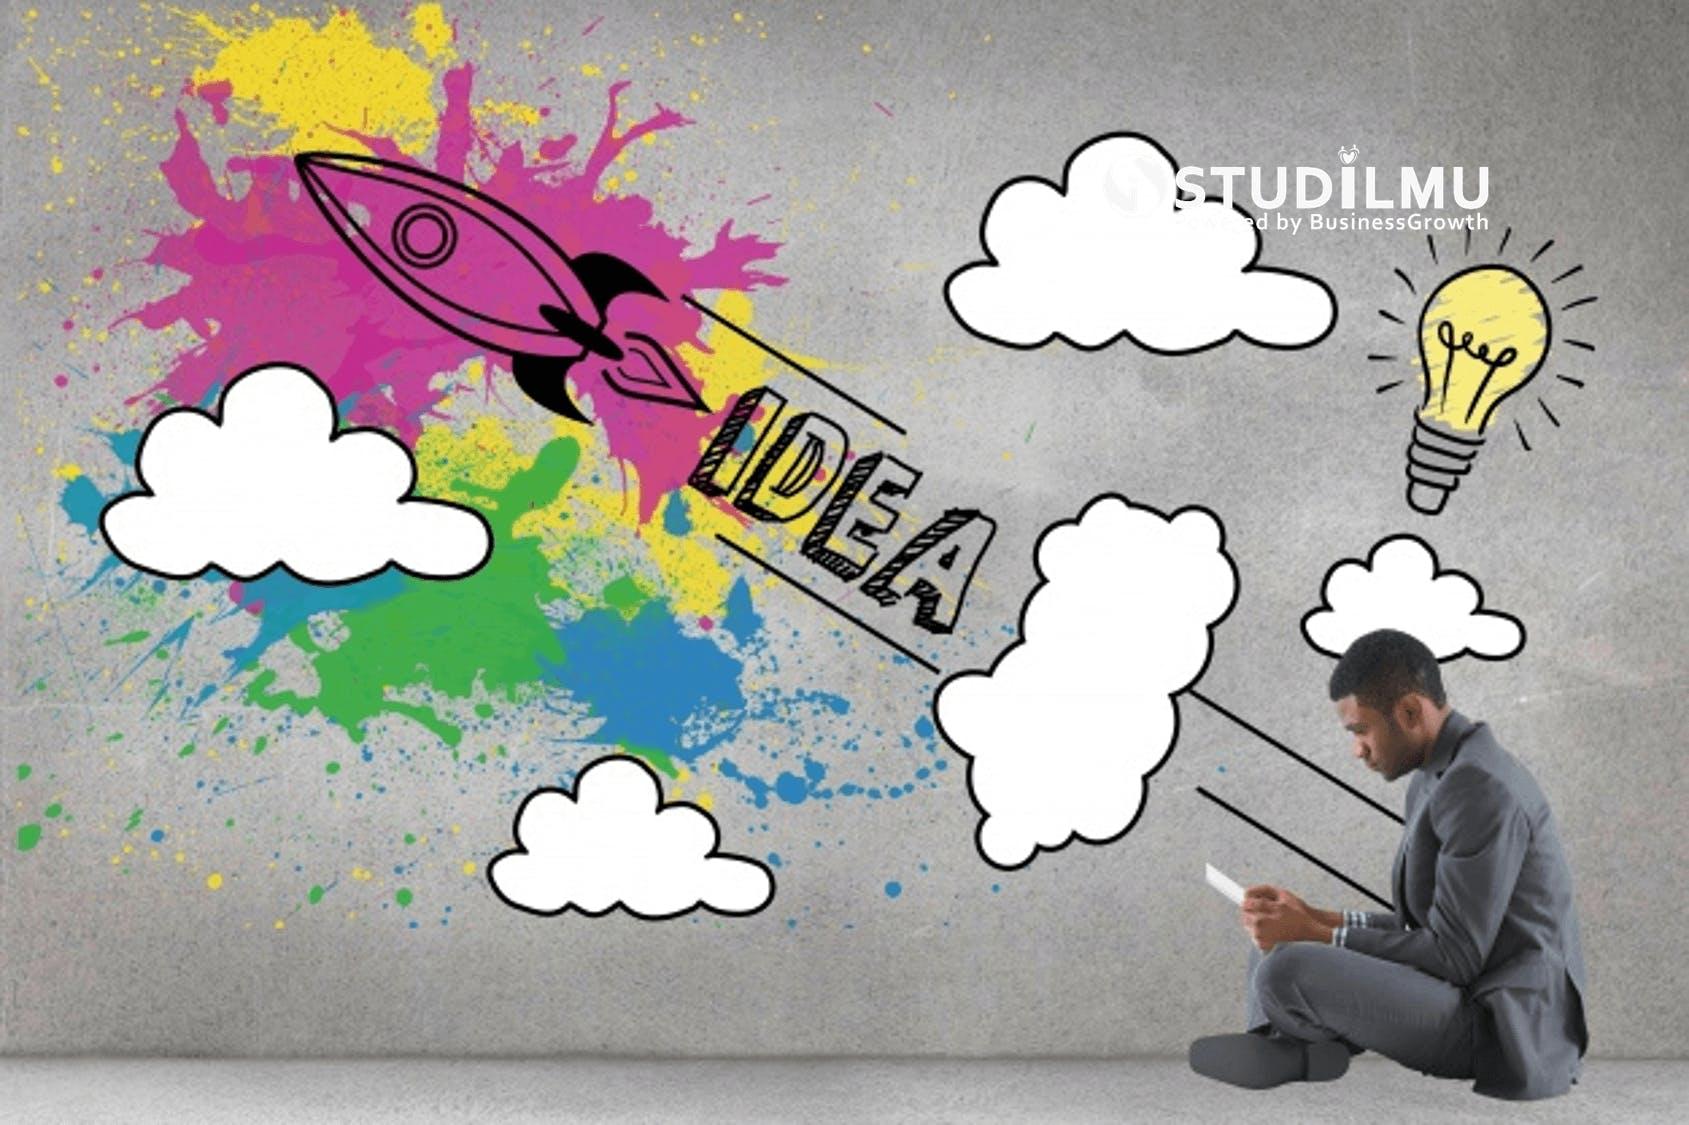 STUDILMU Career Advice - 5 Latihan Kreativitas untuk Mencari Semangat Hidup